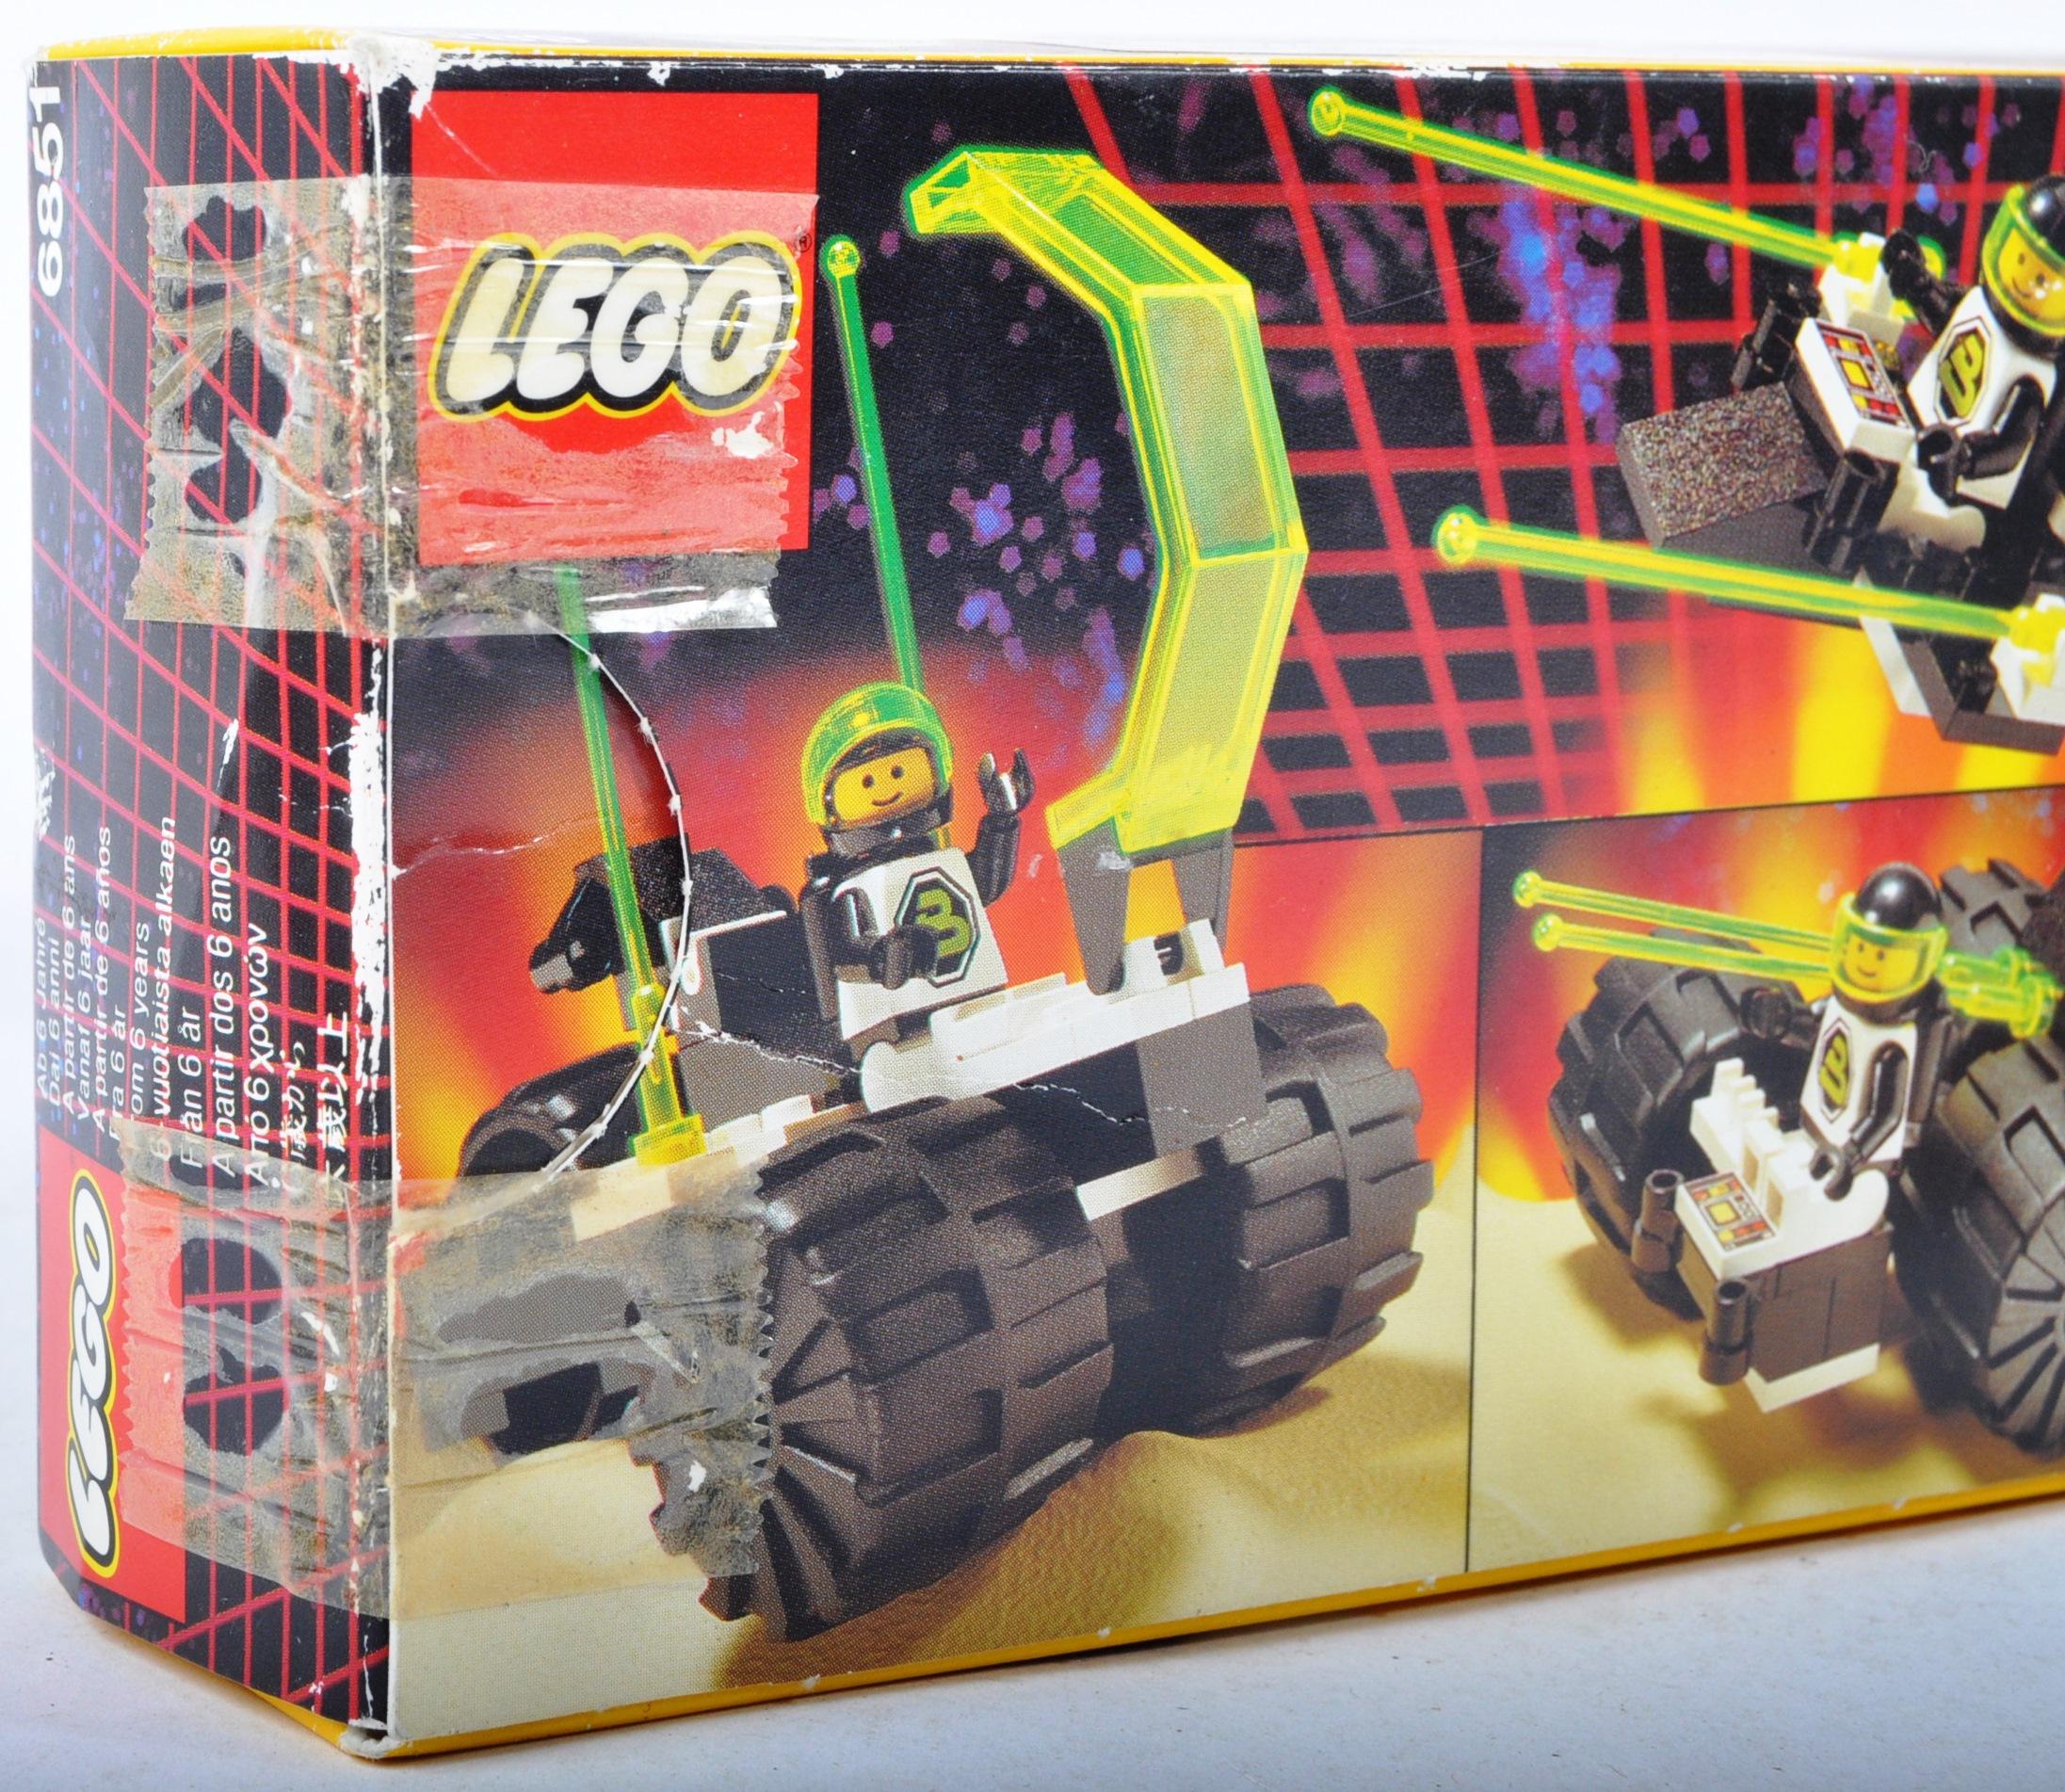 LEGO SETS - BLACKTRON - 6832 / 6833 / 6851 / 6878 / 6887 - Image 6 of 10